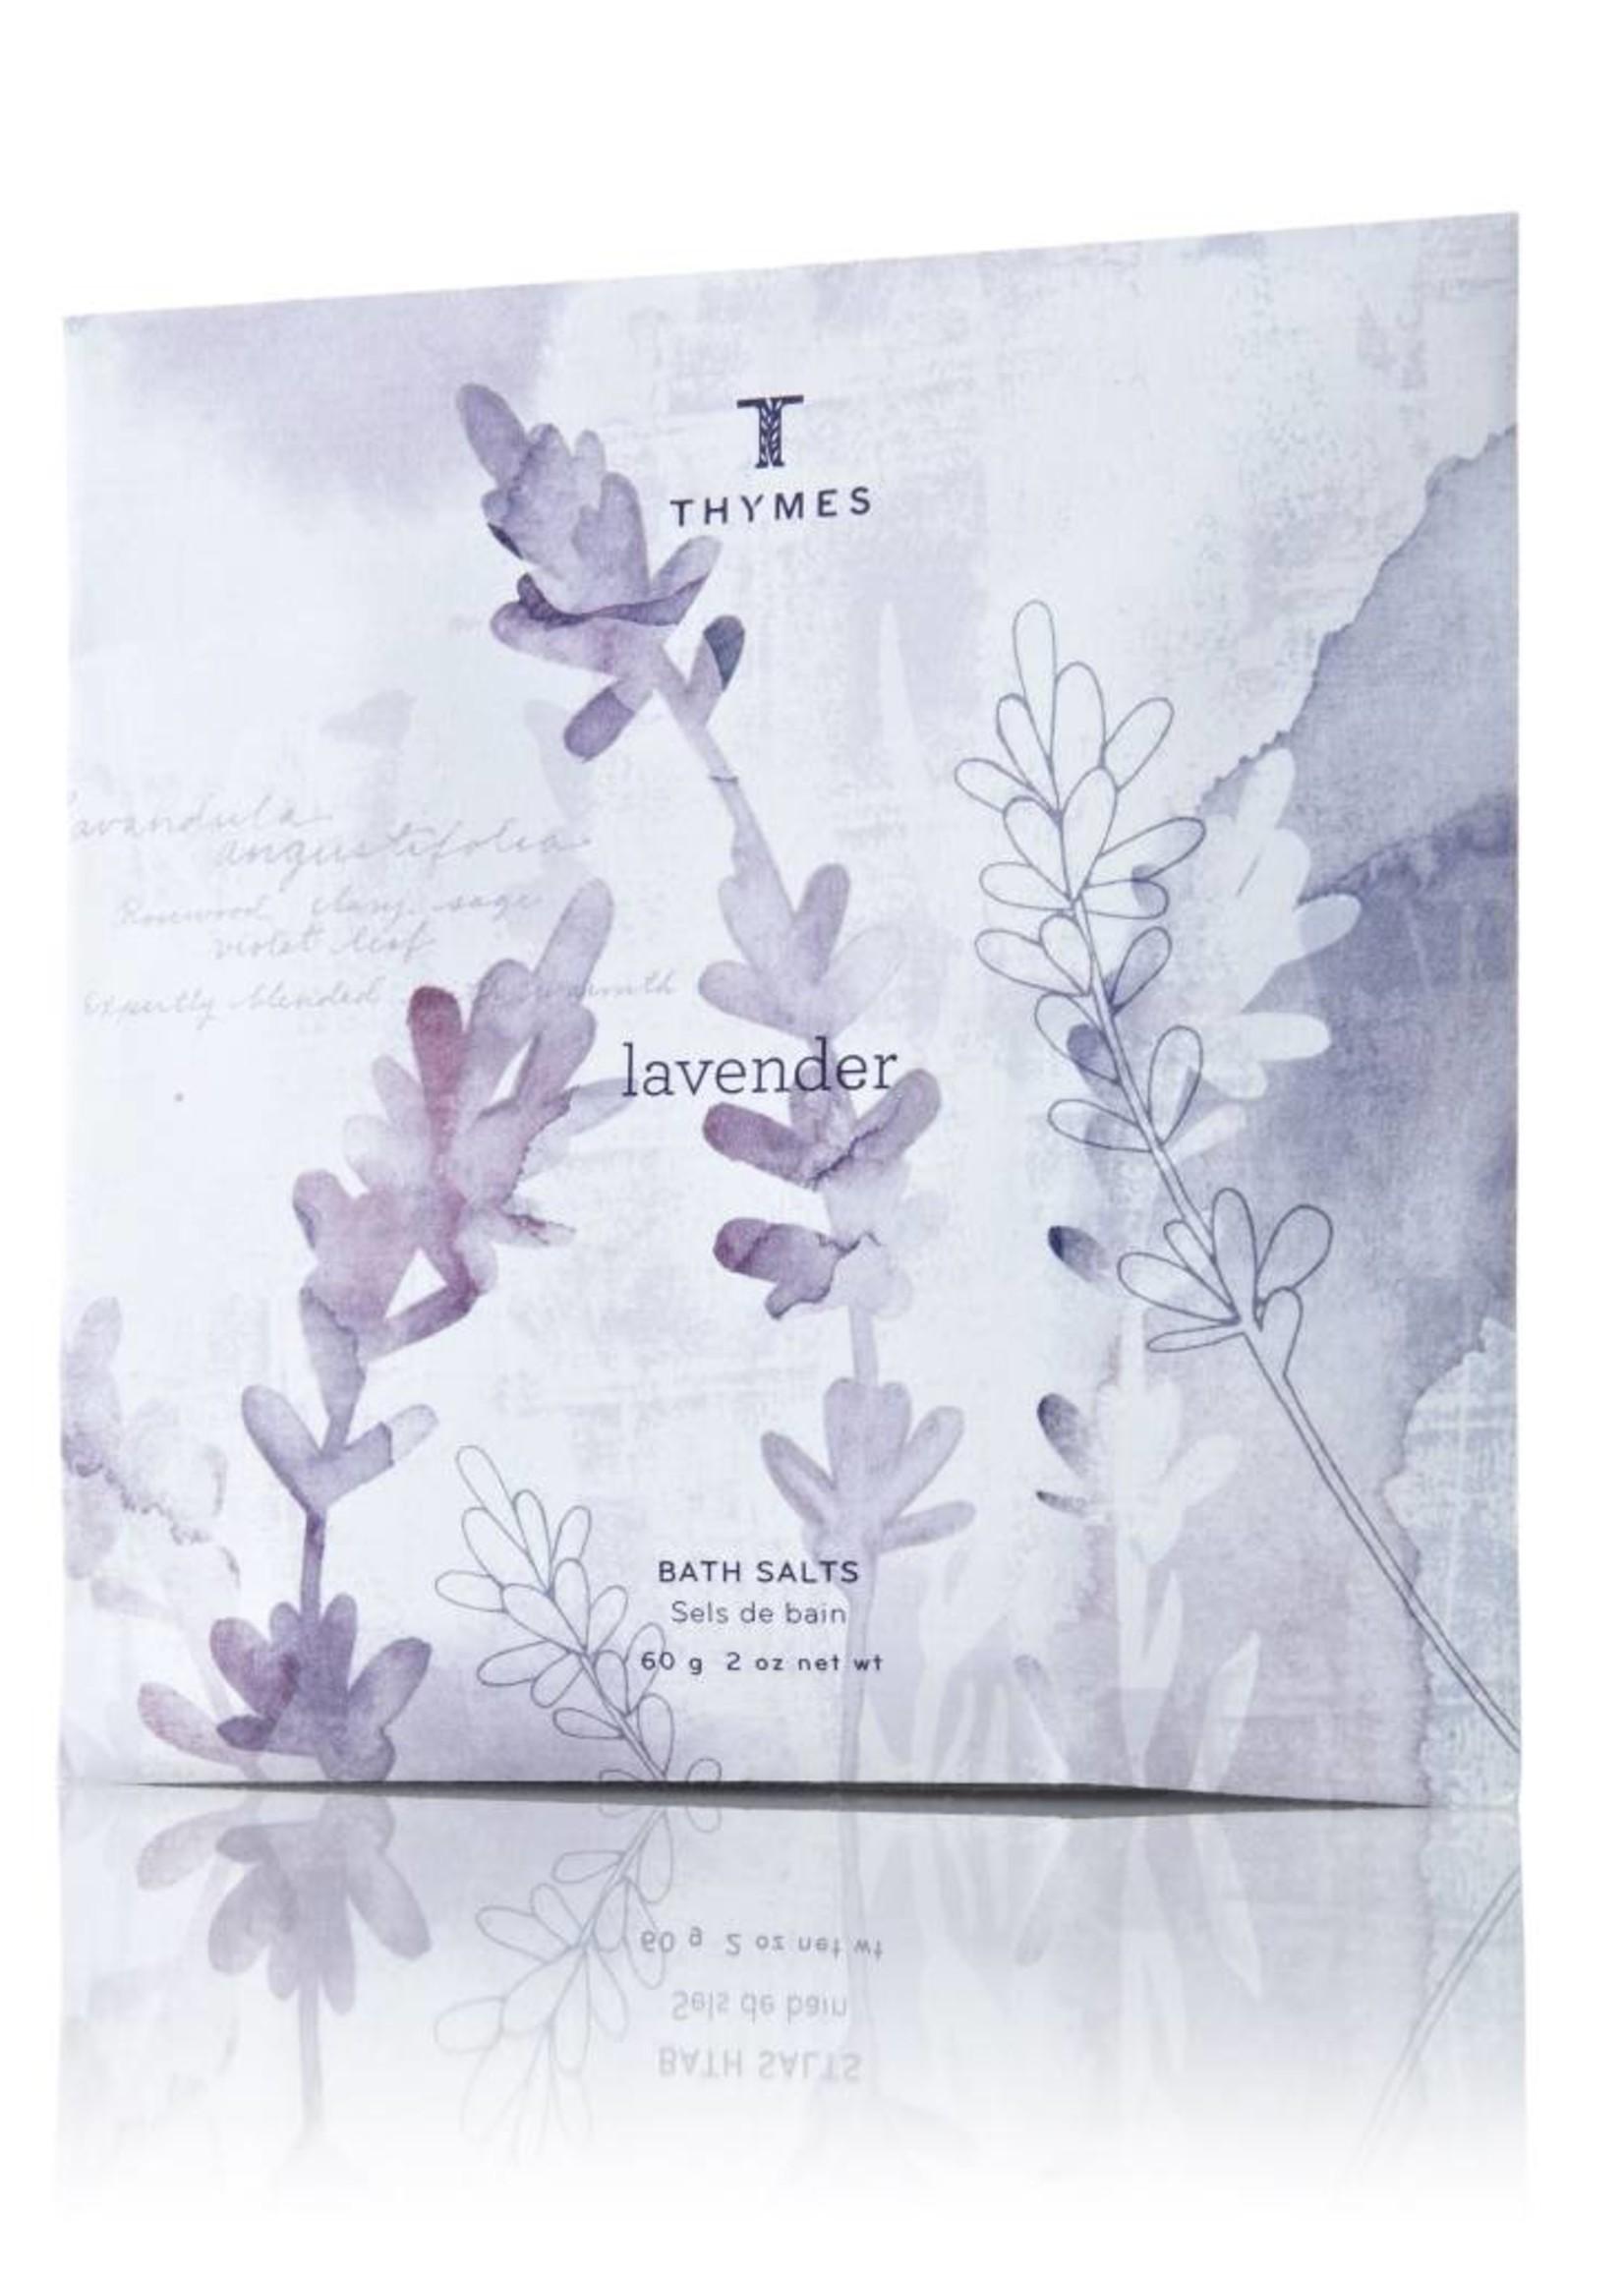 Thymes Lavender Bath Salts Envelope